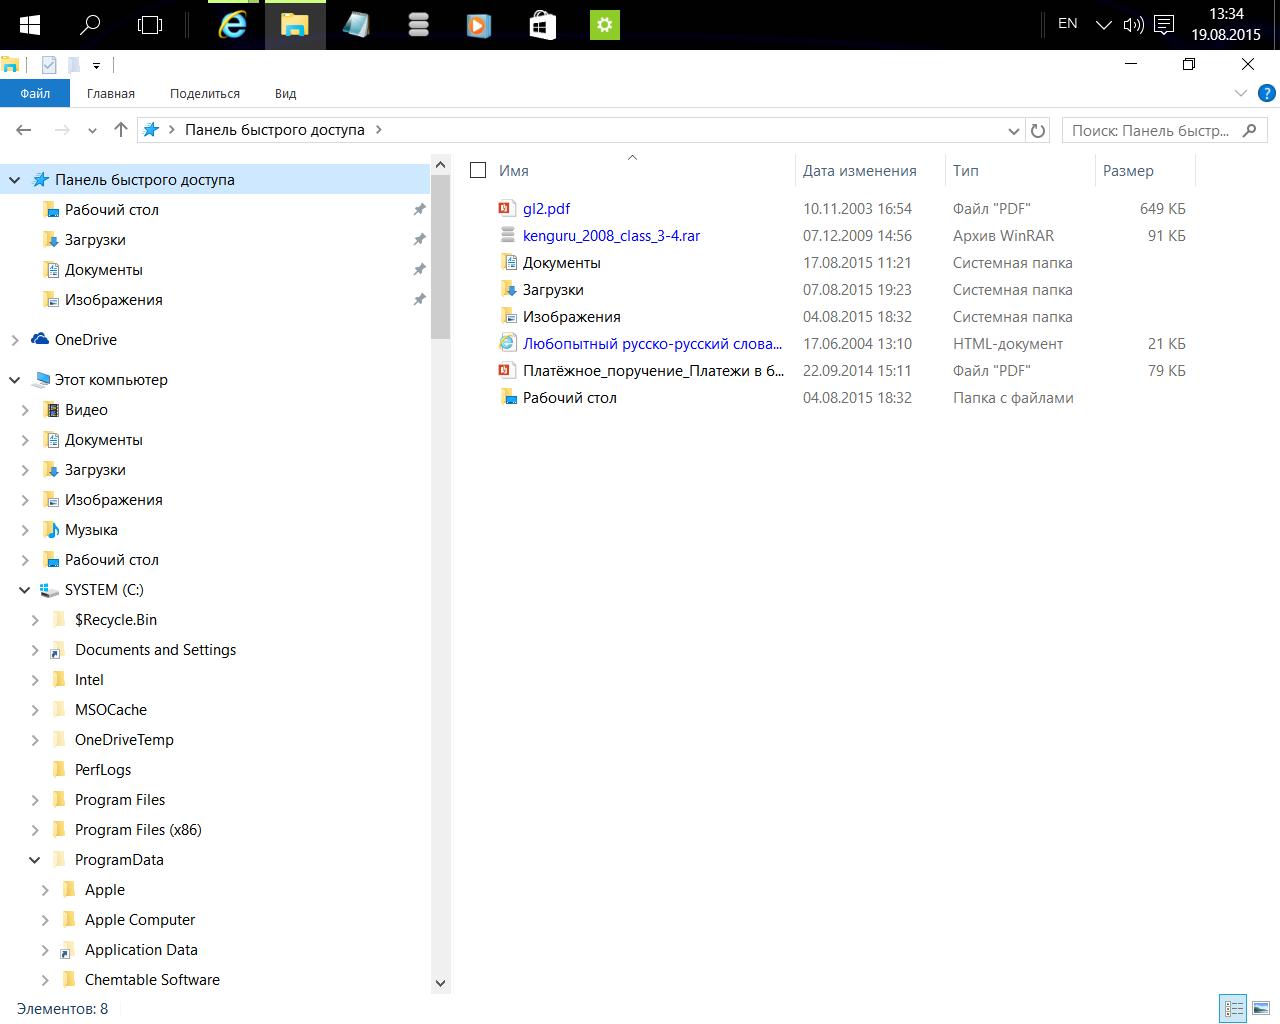 how to add folders to start menu in windows 10